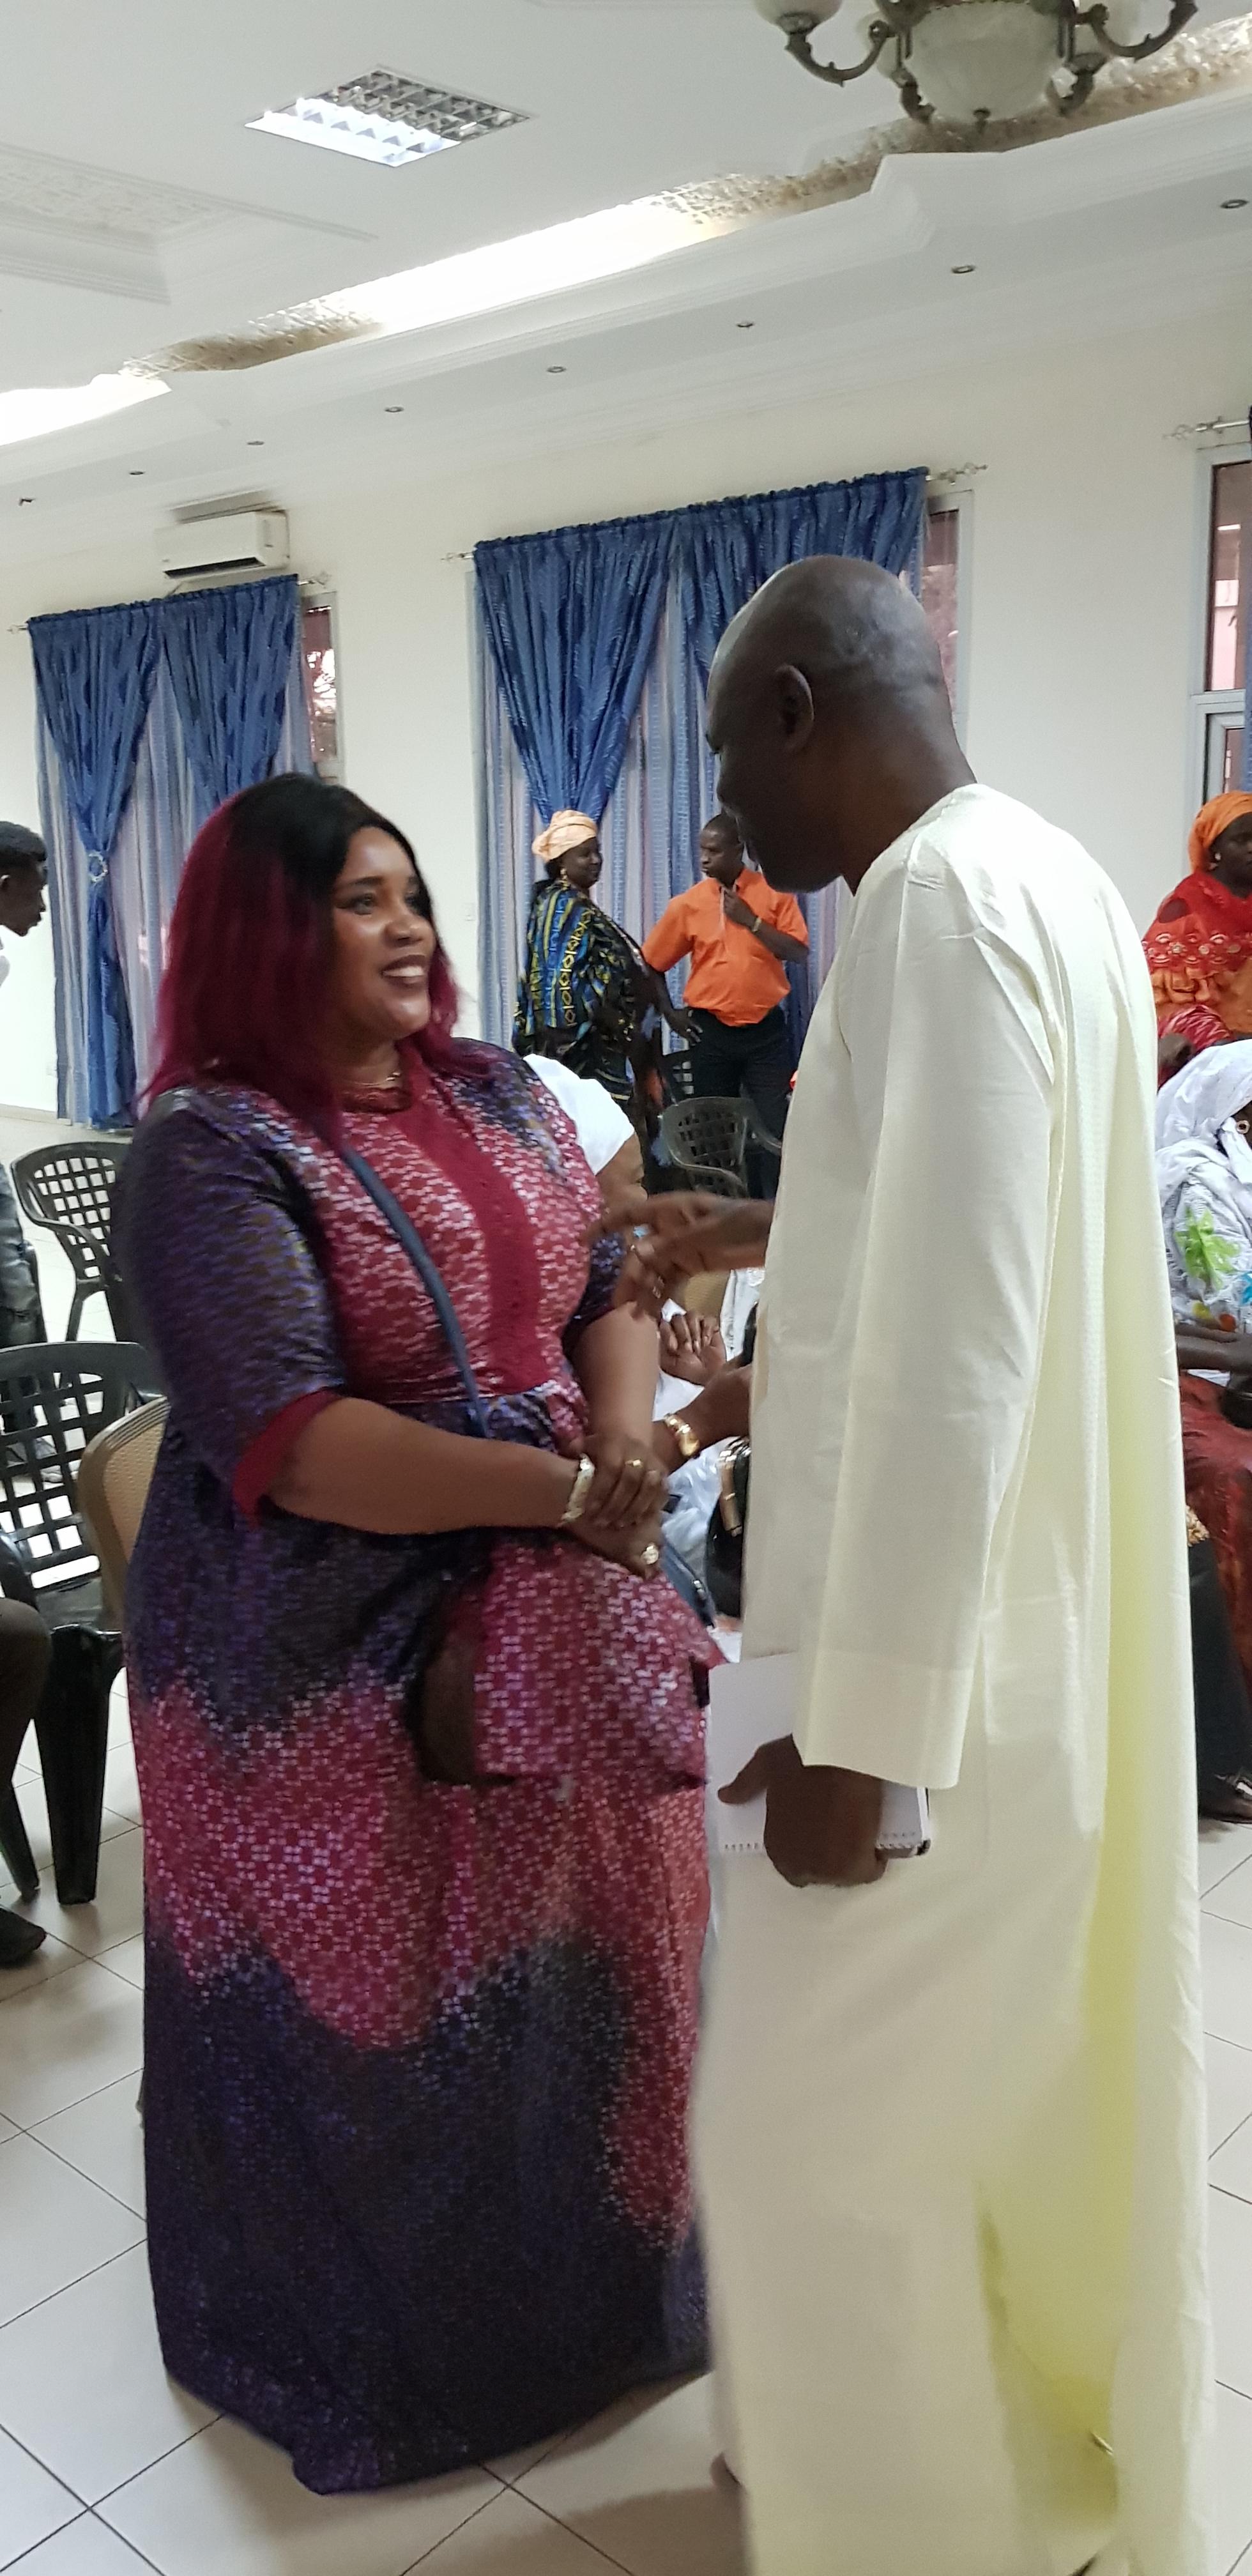 Harouna Dia, de Pikine à Kanel pour un seul objectif: massifier et réélire Macky Sall